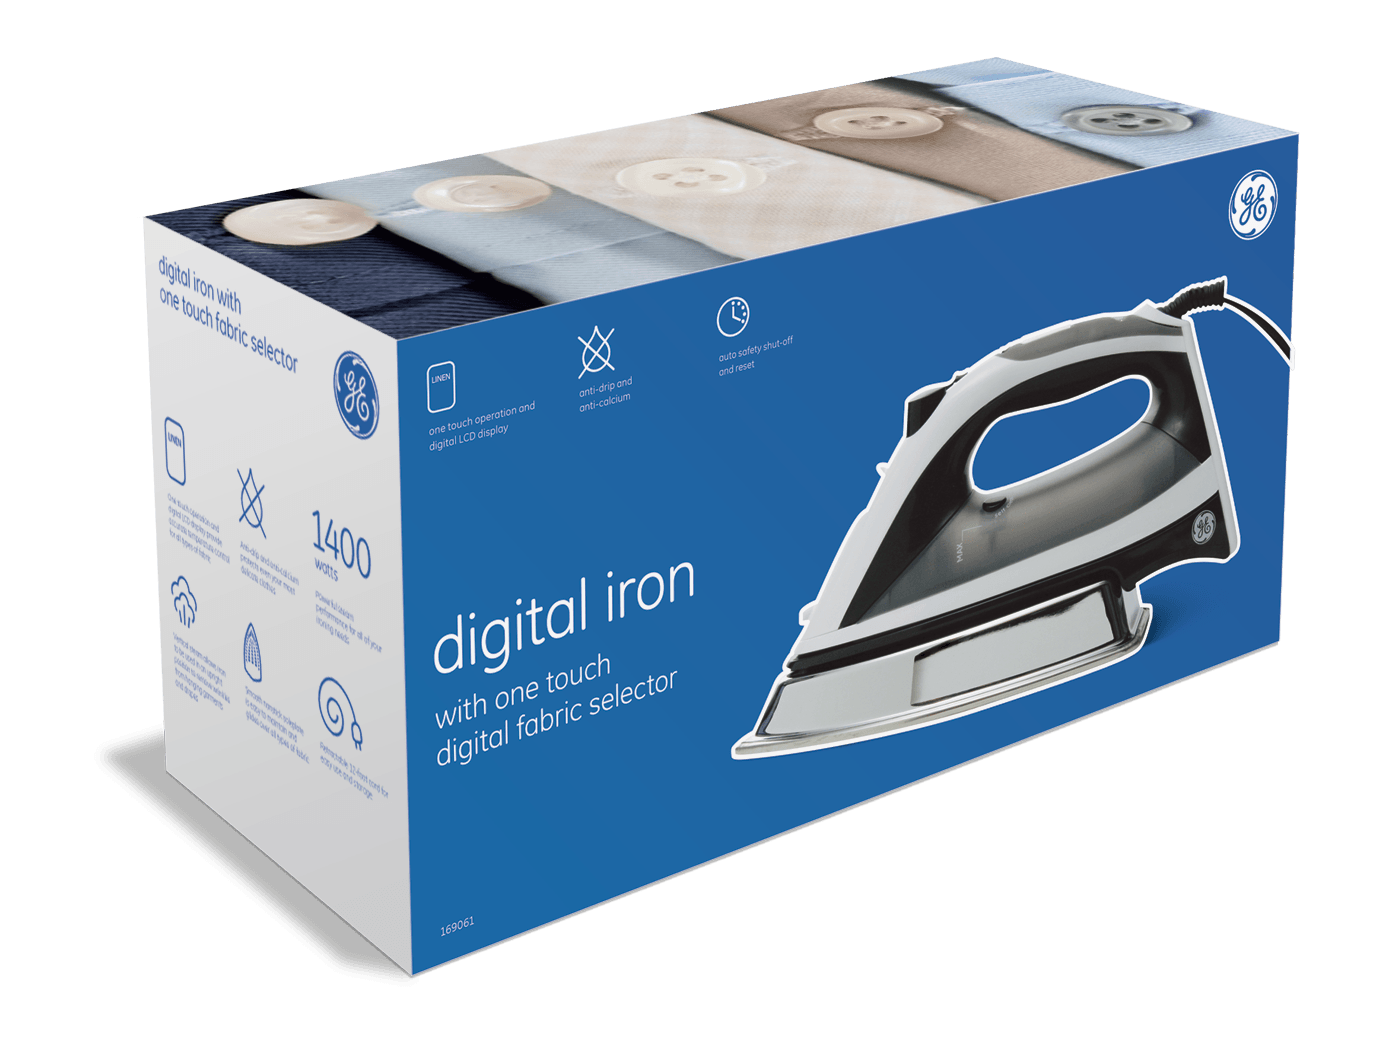 GE0604_Digital iron blue2